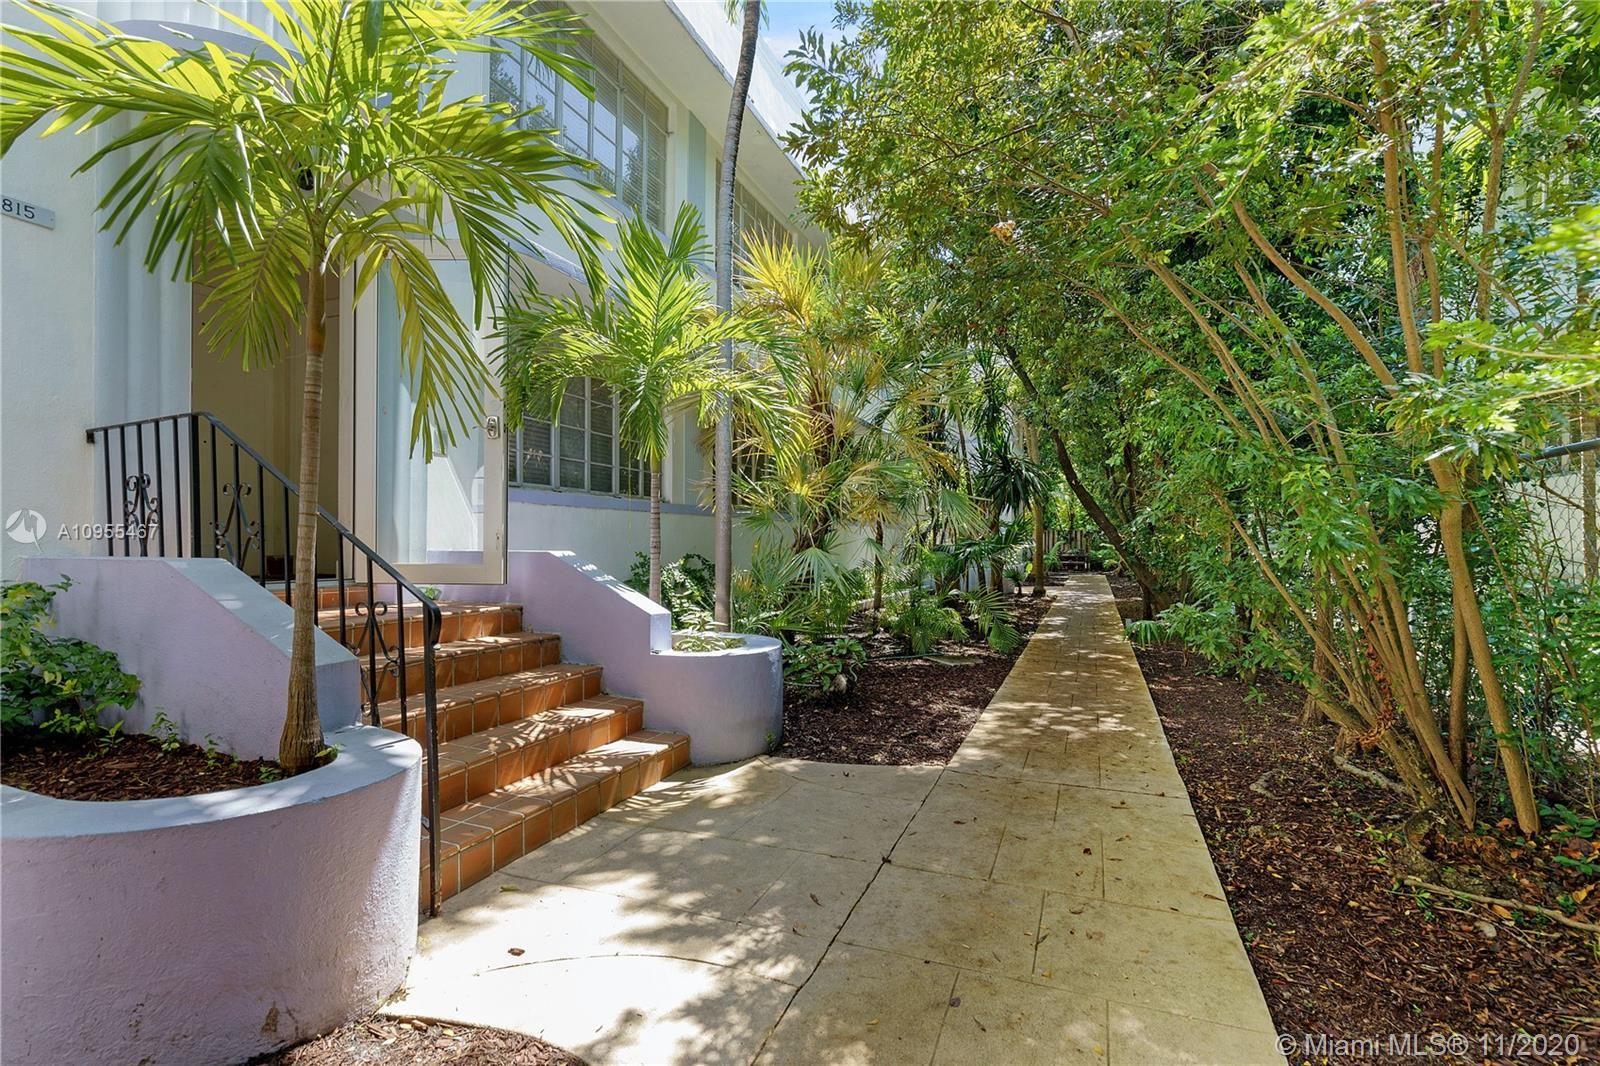 815 Lenox Ave #4, Miami Beach, FL 33139 - #: A10955467